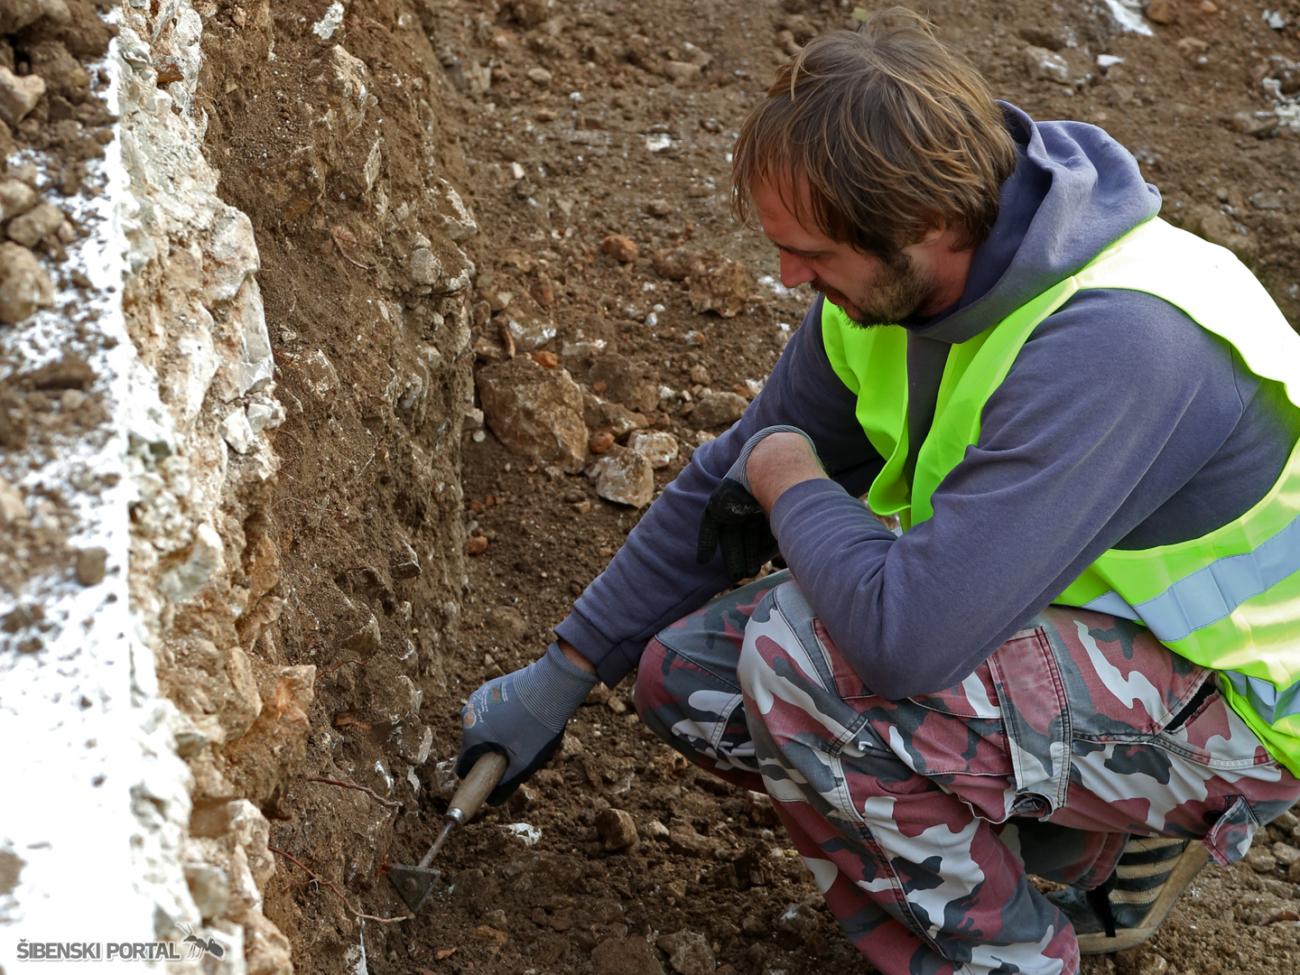 poljana radovi arheolozi 020217 6